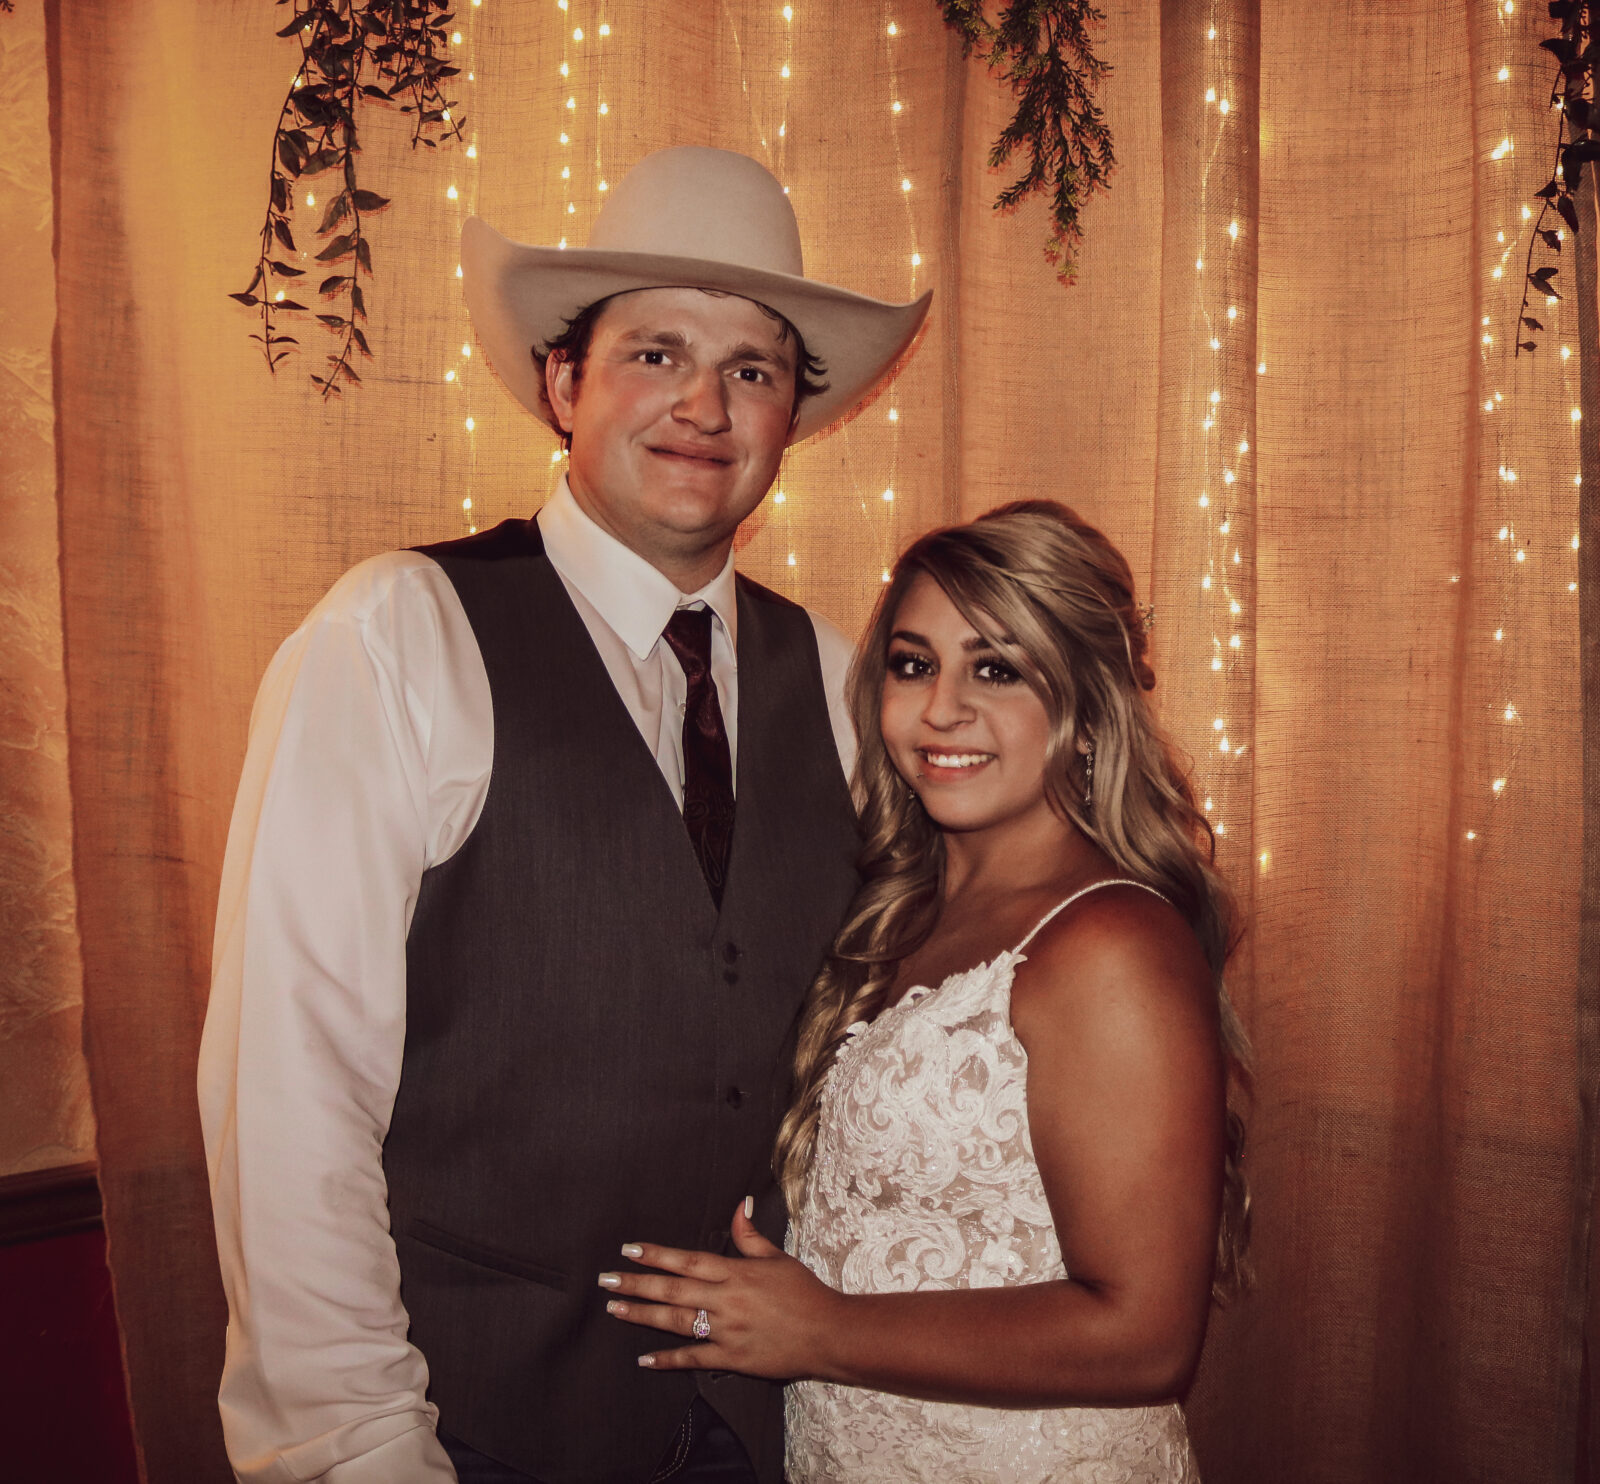 Gary Uhrich The DJ Music System Nebraska Wedding DJ, Wedding Planning Service